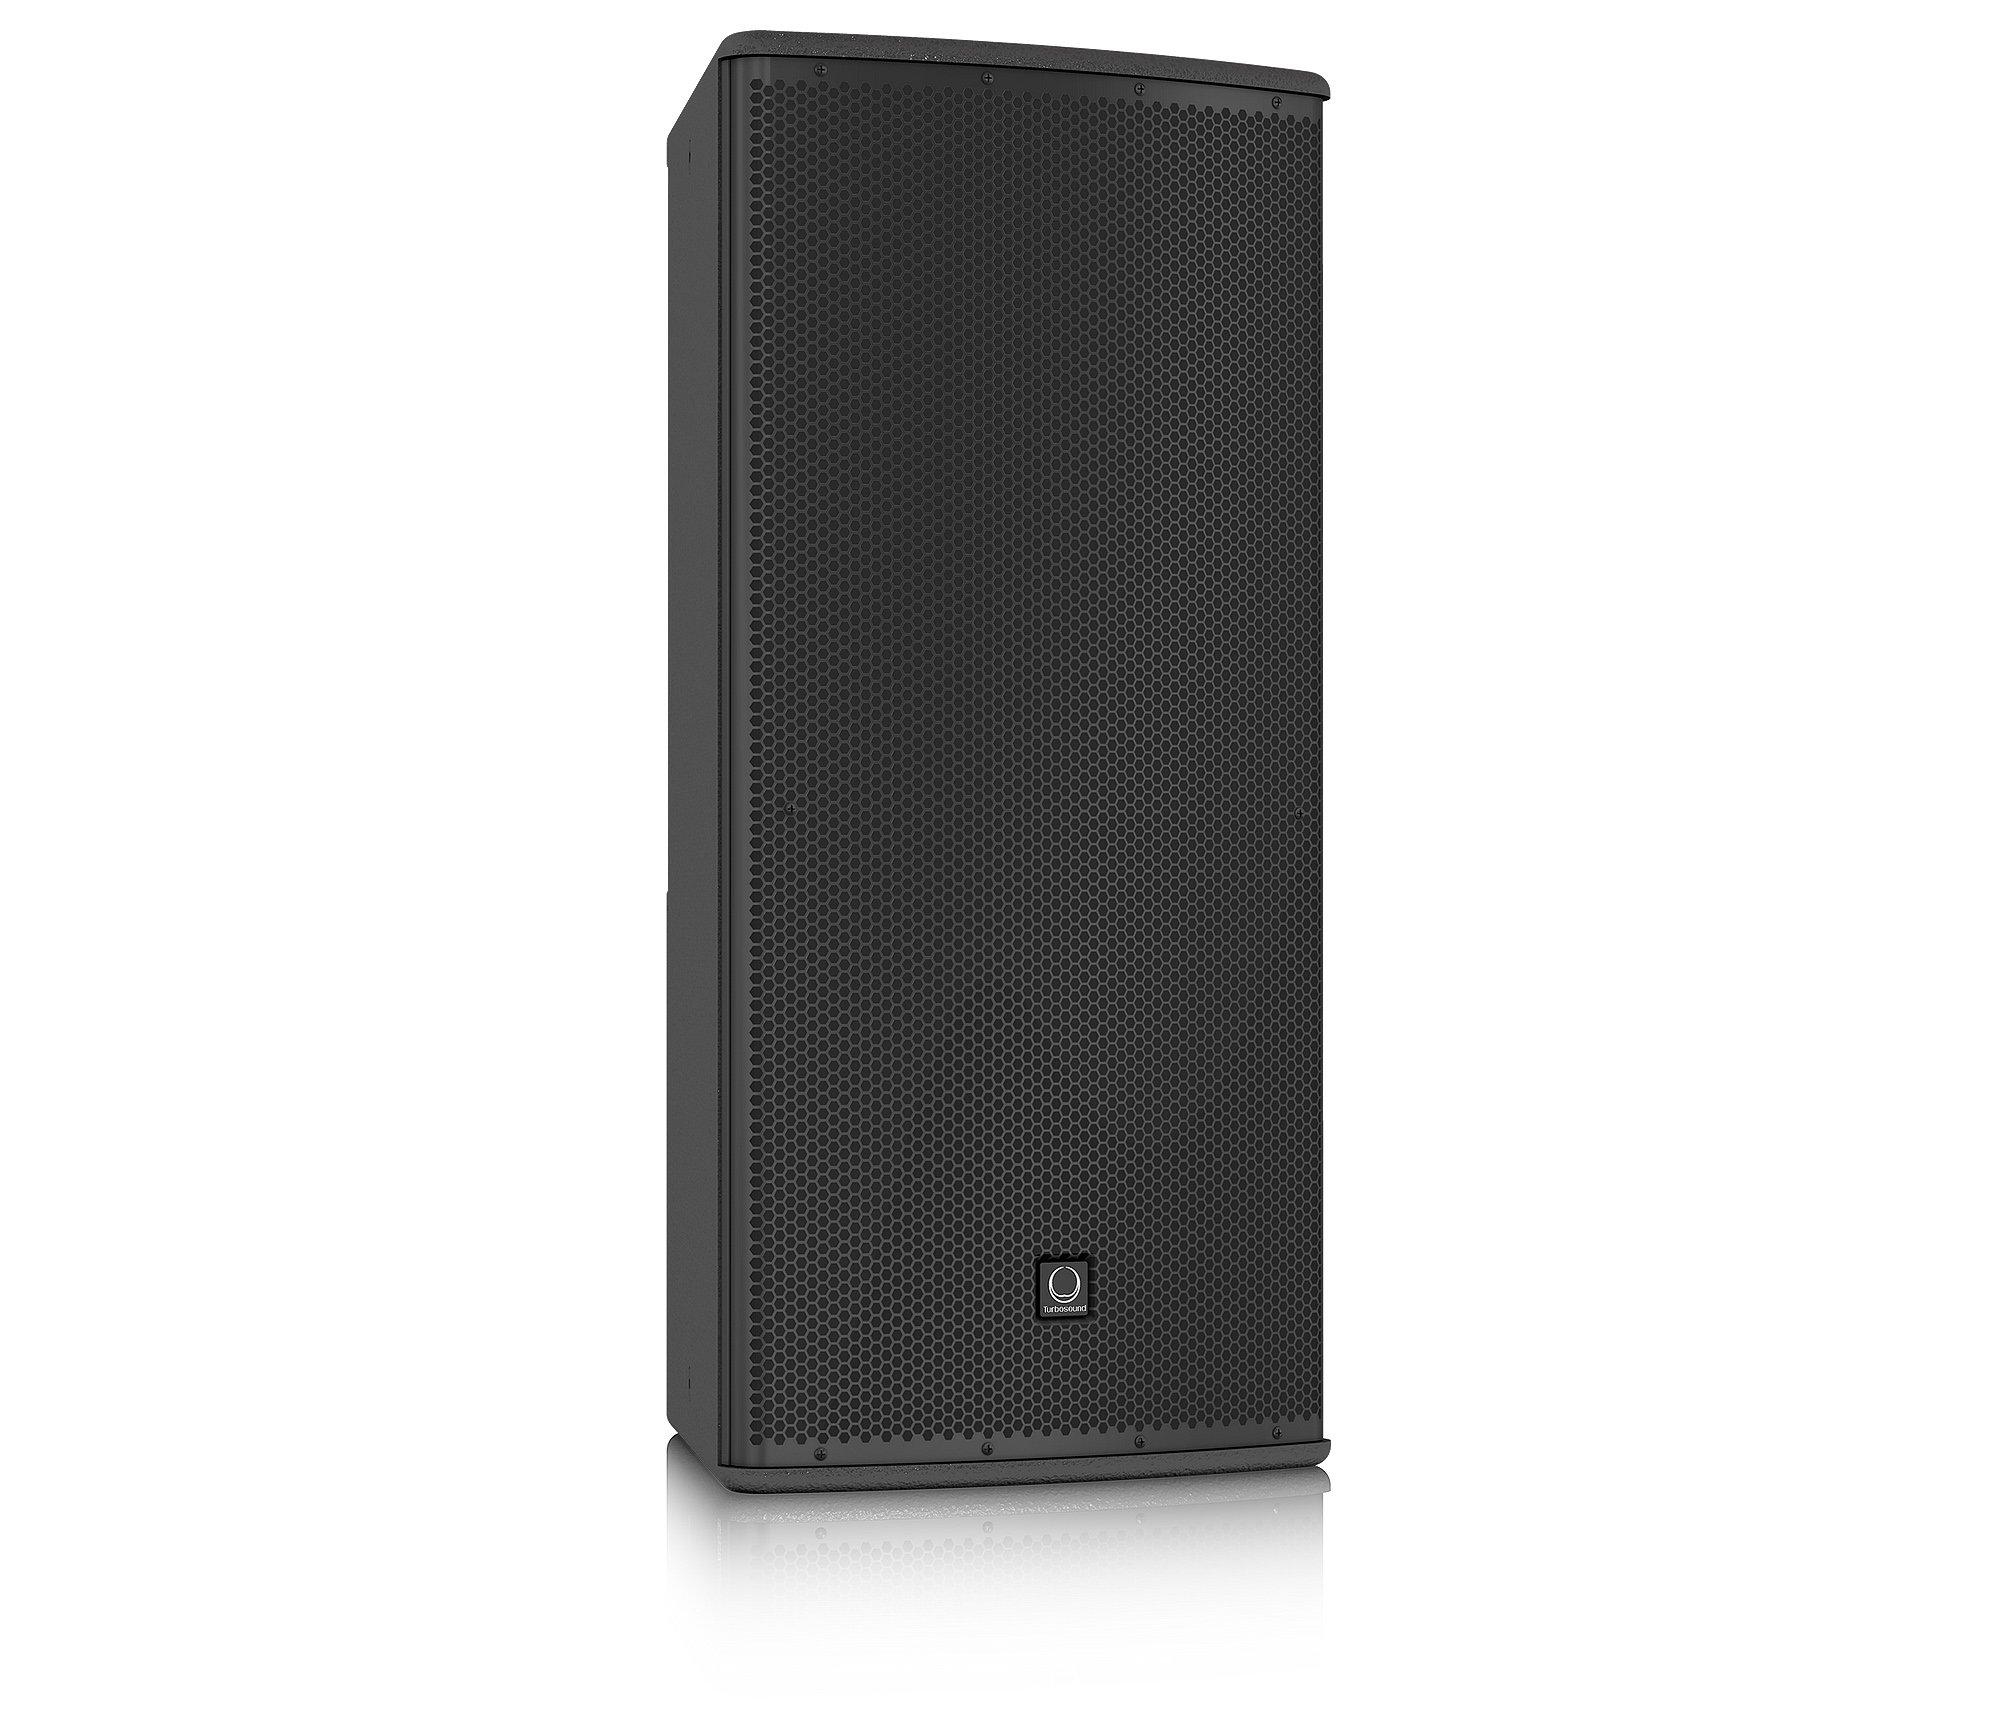 "12"" 600W (8 Ohms) 2-Way Full-Range Passive/Bi-Amp Loudspeaker with Klark Teknik DSP, ULTRANET Networking, and 90°x60° Dispersion in Black"